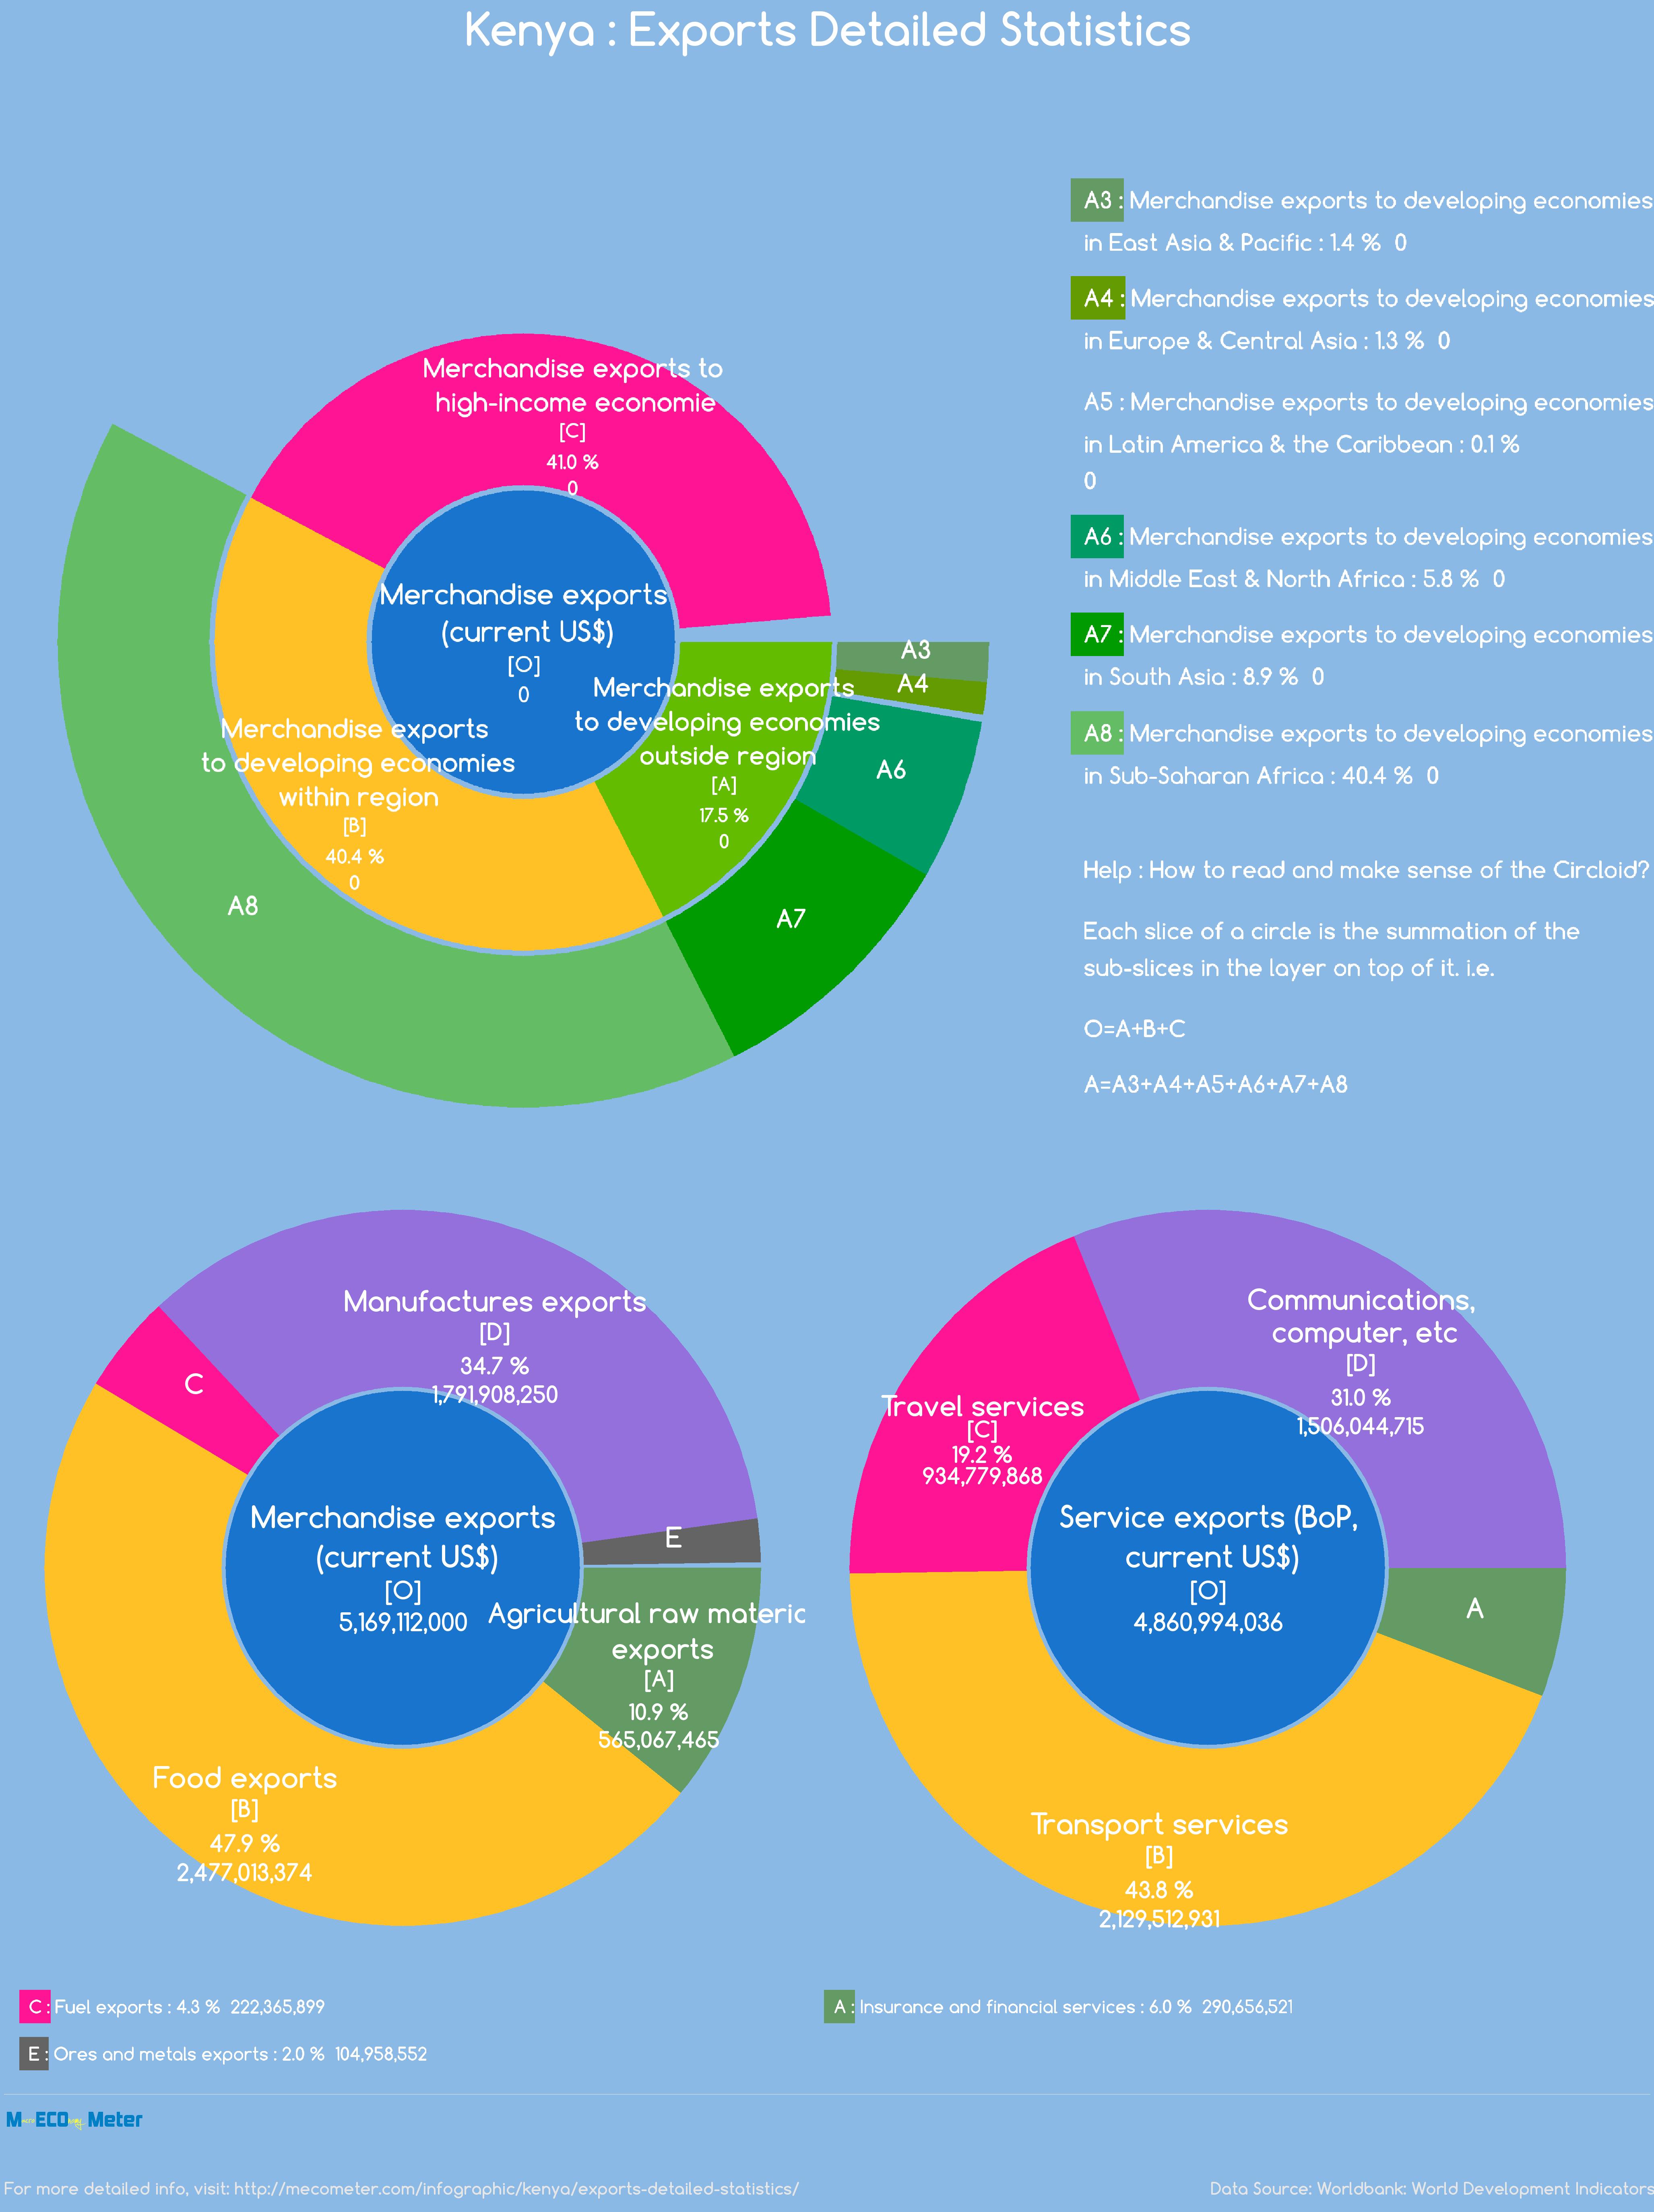 Kenya : Exports Detailed Statistics